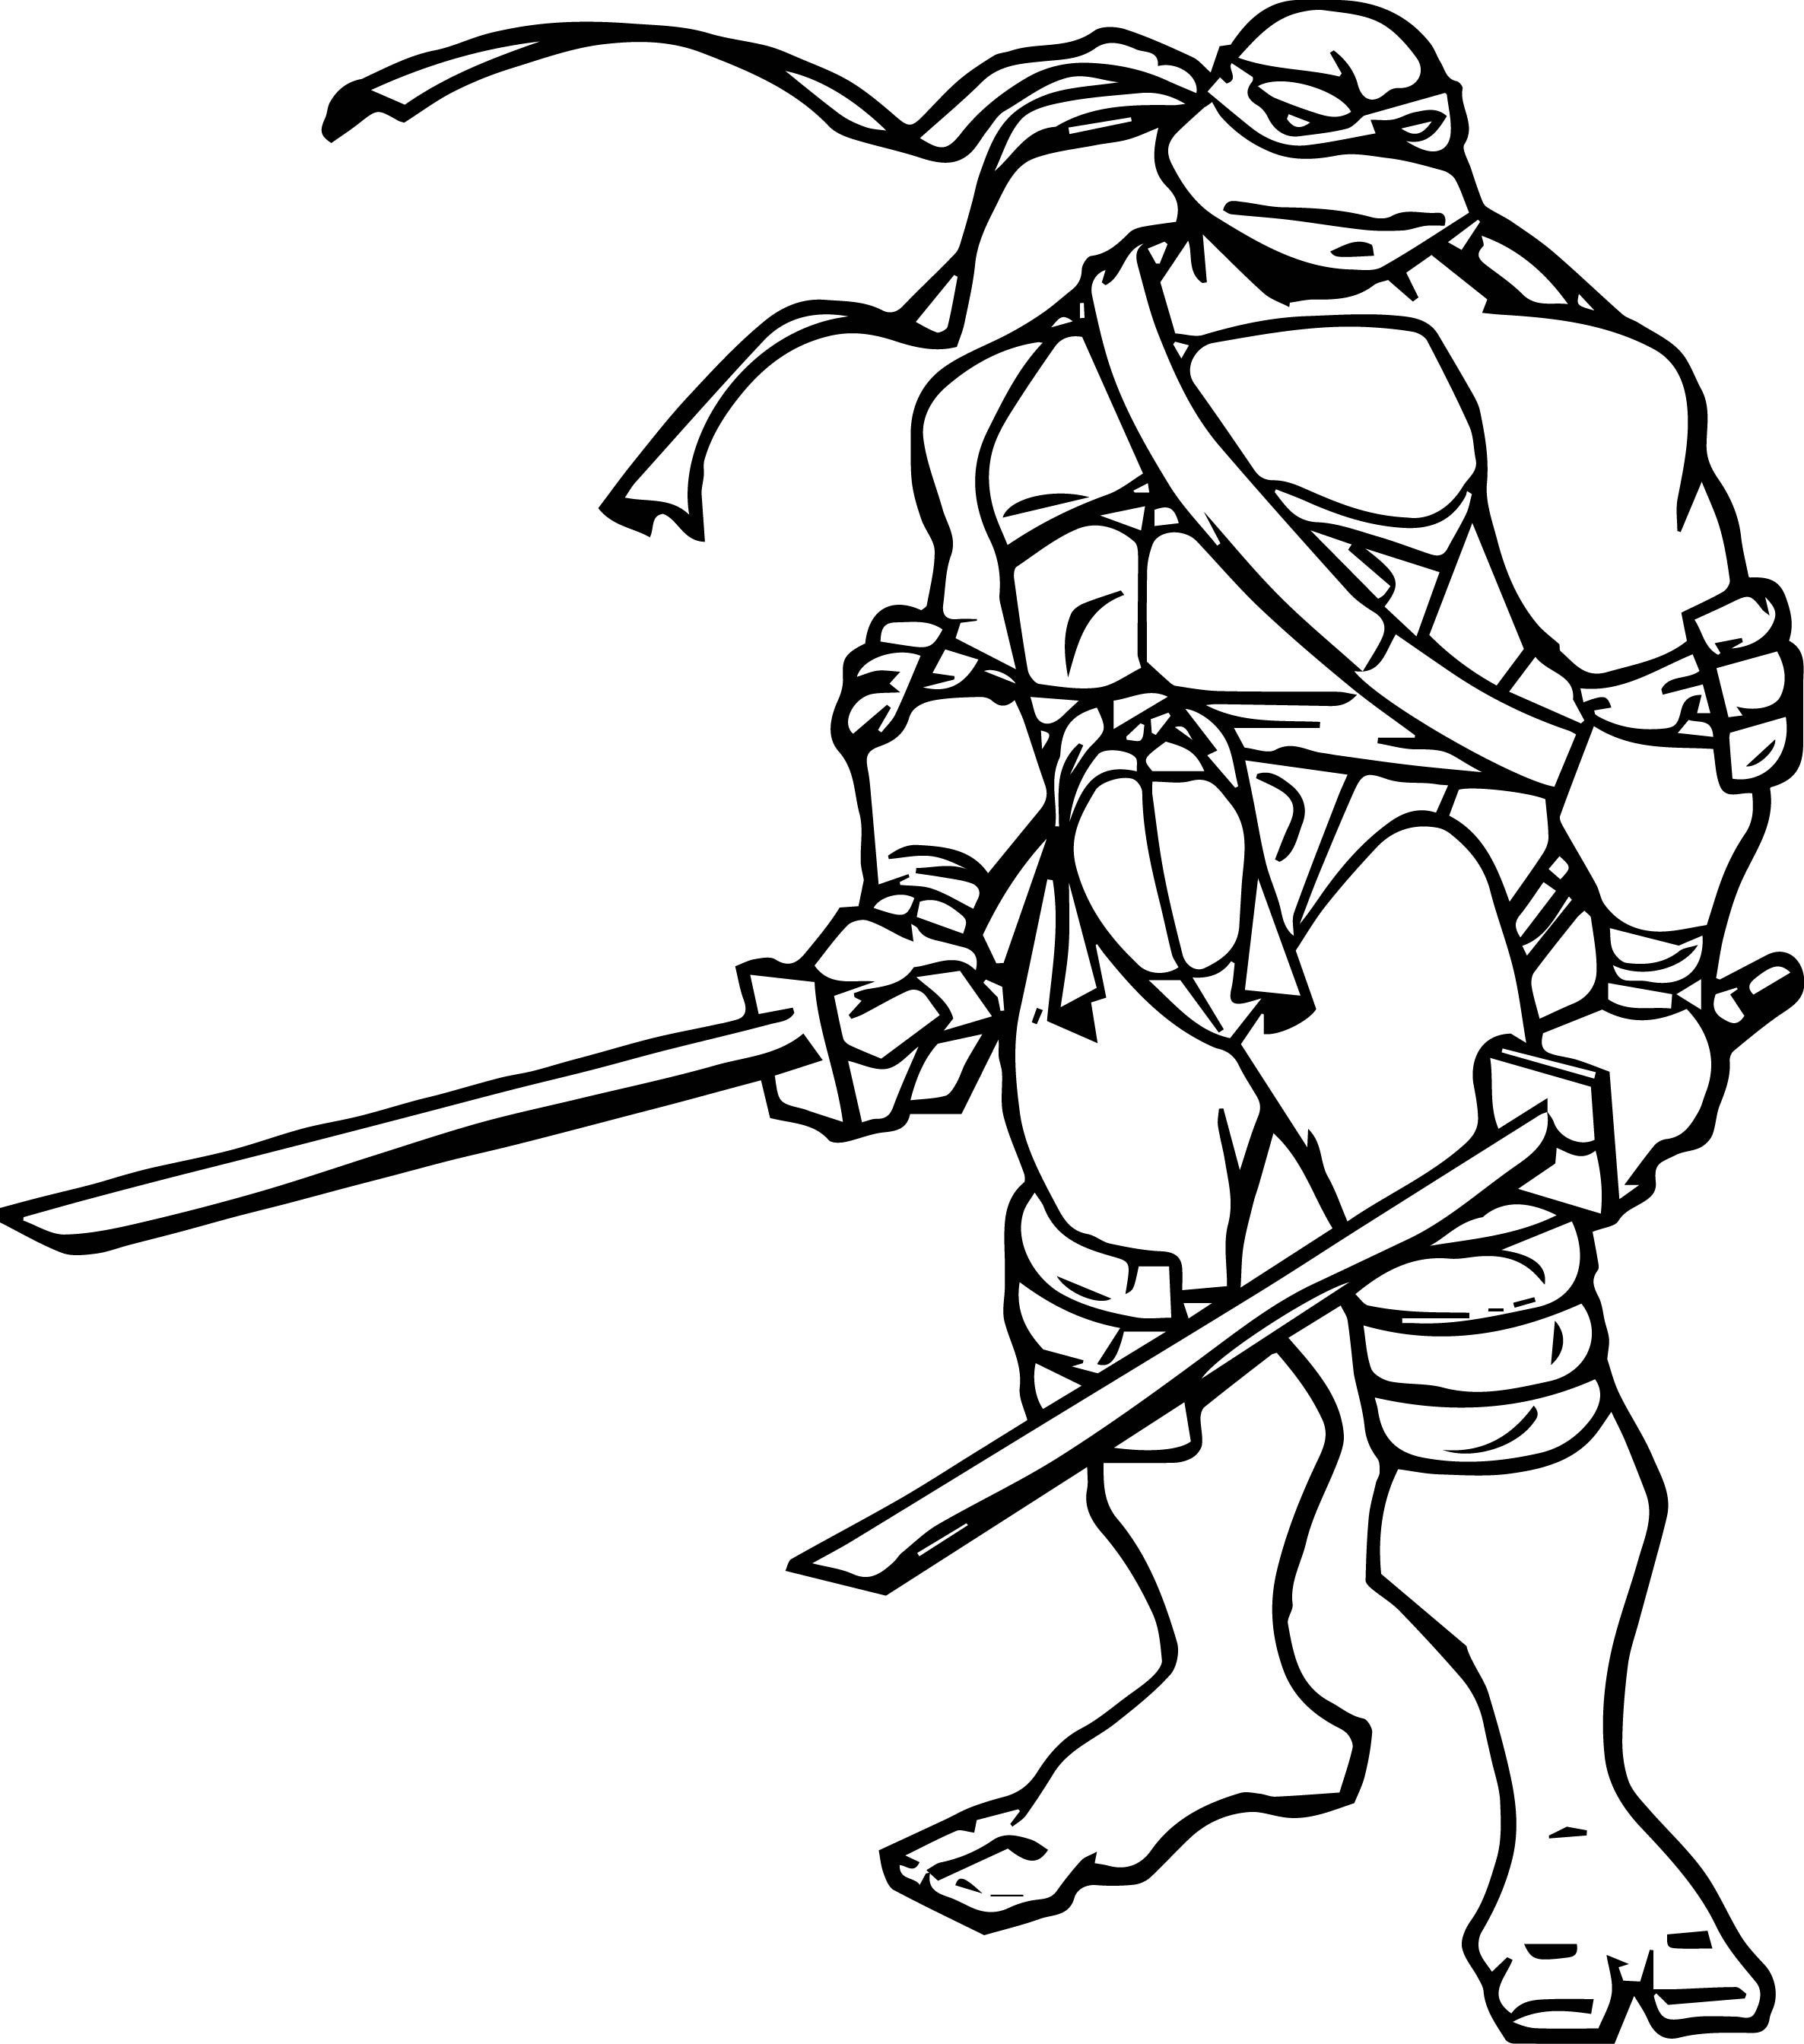 Ninja Turtle Ausmalbilder Genial Teenage Mutant Ninja Turtles Faces Coloring Pages Unique 44 Neu Galerie